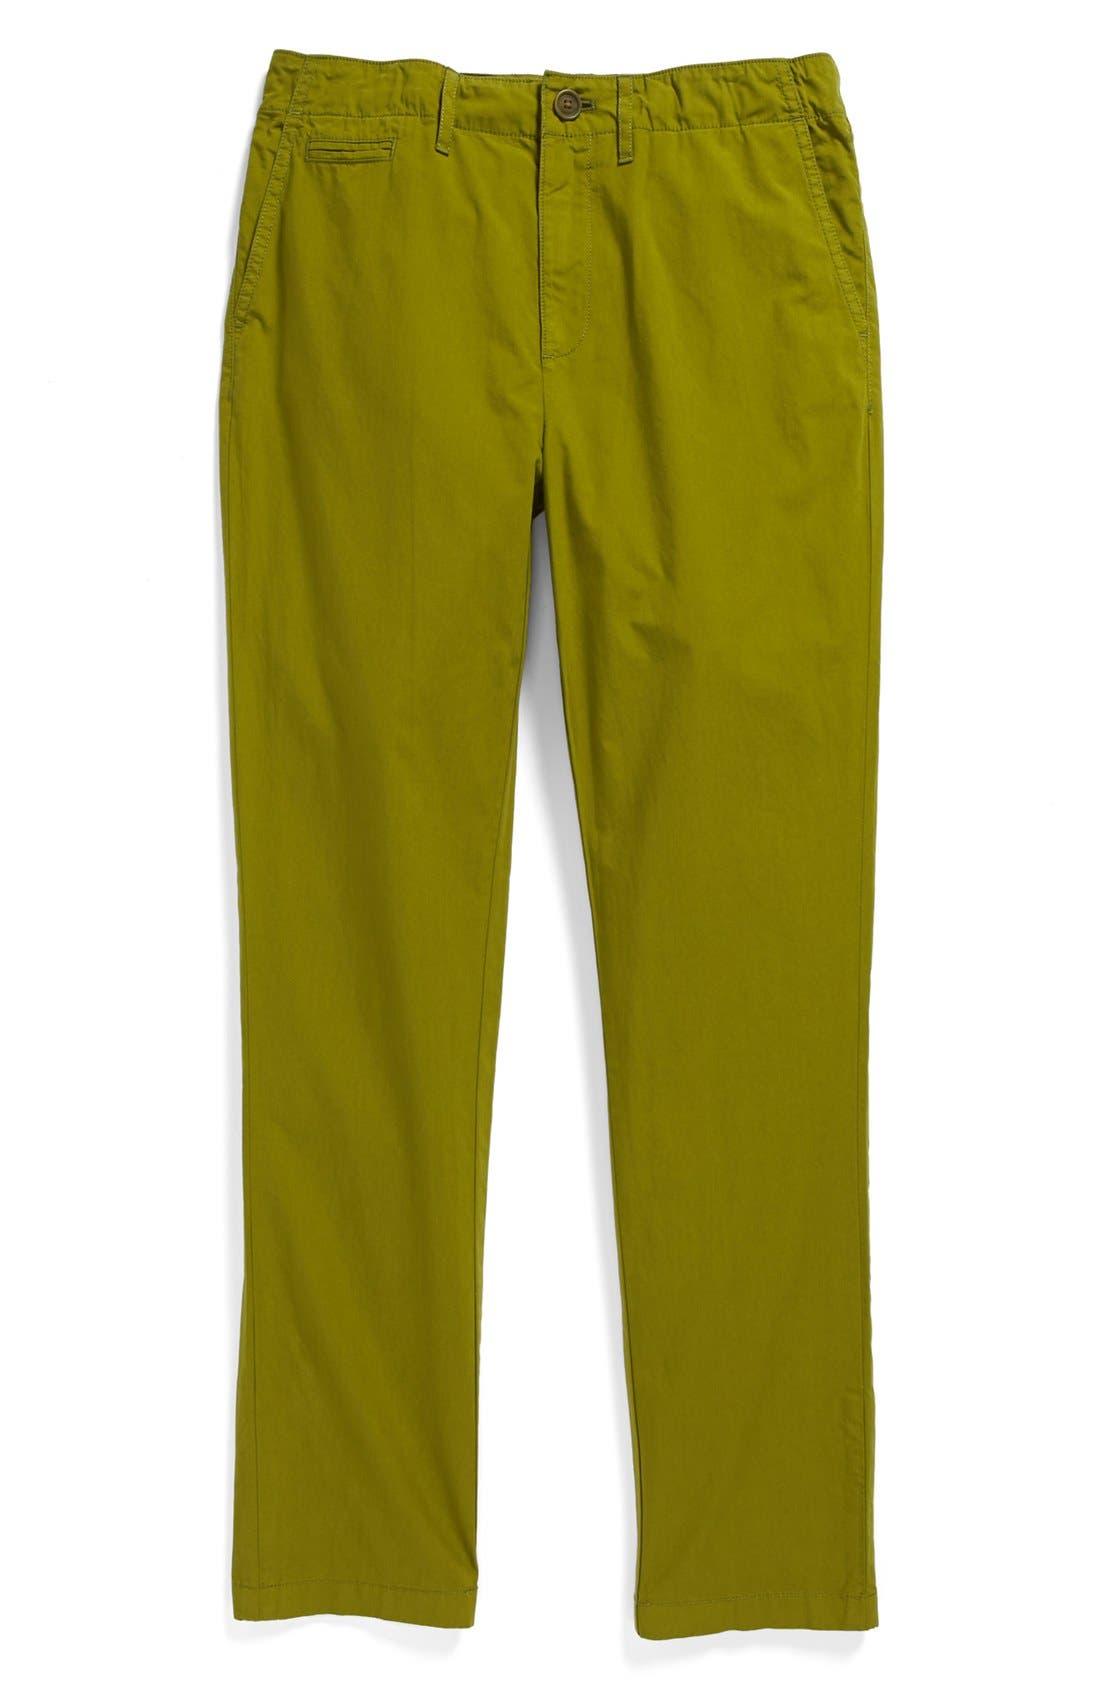 Alternate Image 1 Selected - Burberry Straight Leg Pants (Toddler Boys, Little Boys & Big Boys)